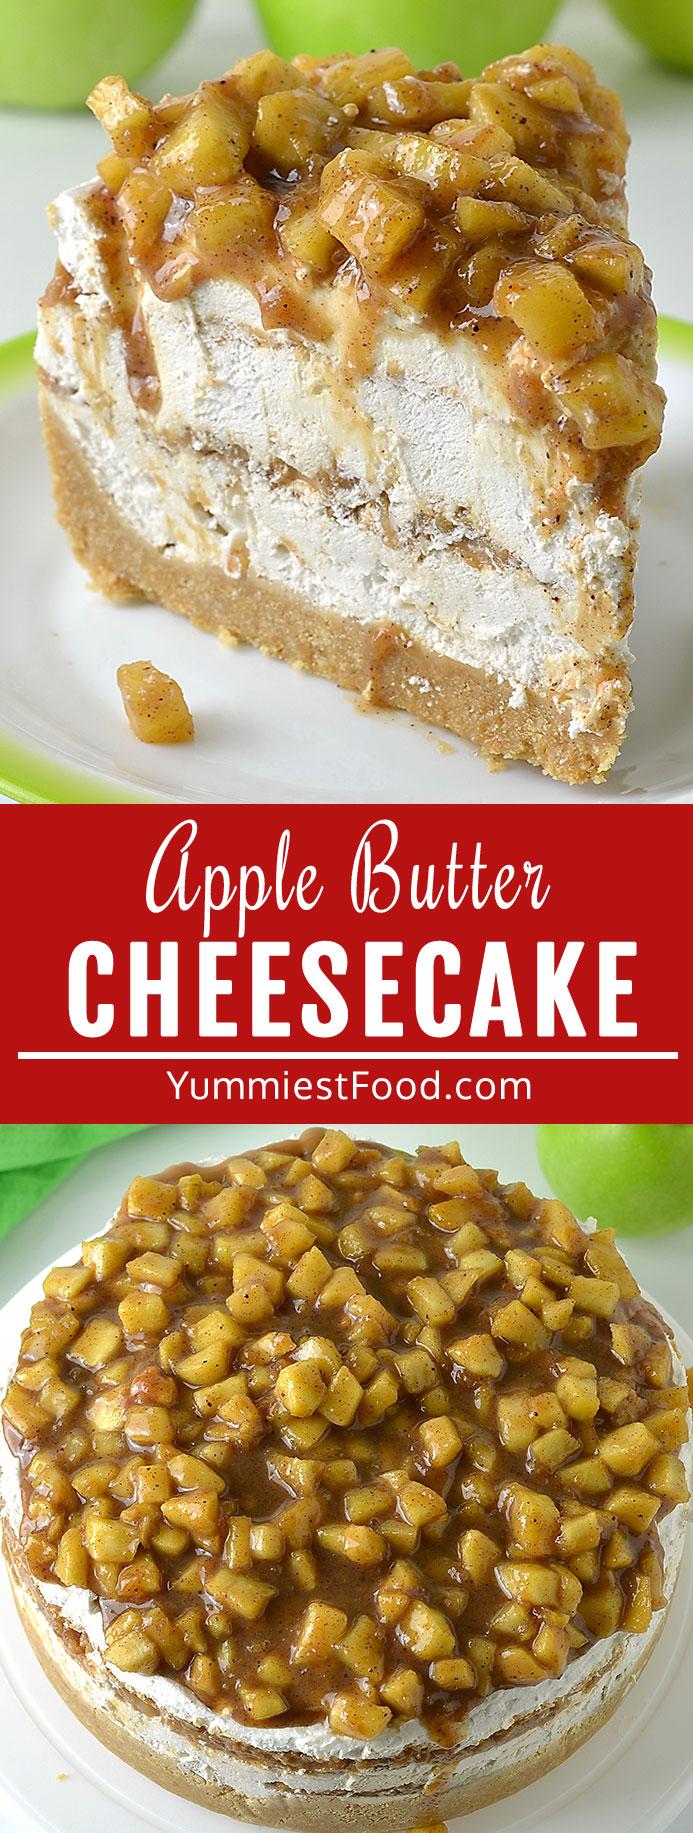 Apple Butter Cheesecake Recipe